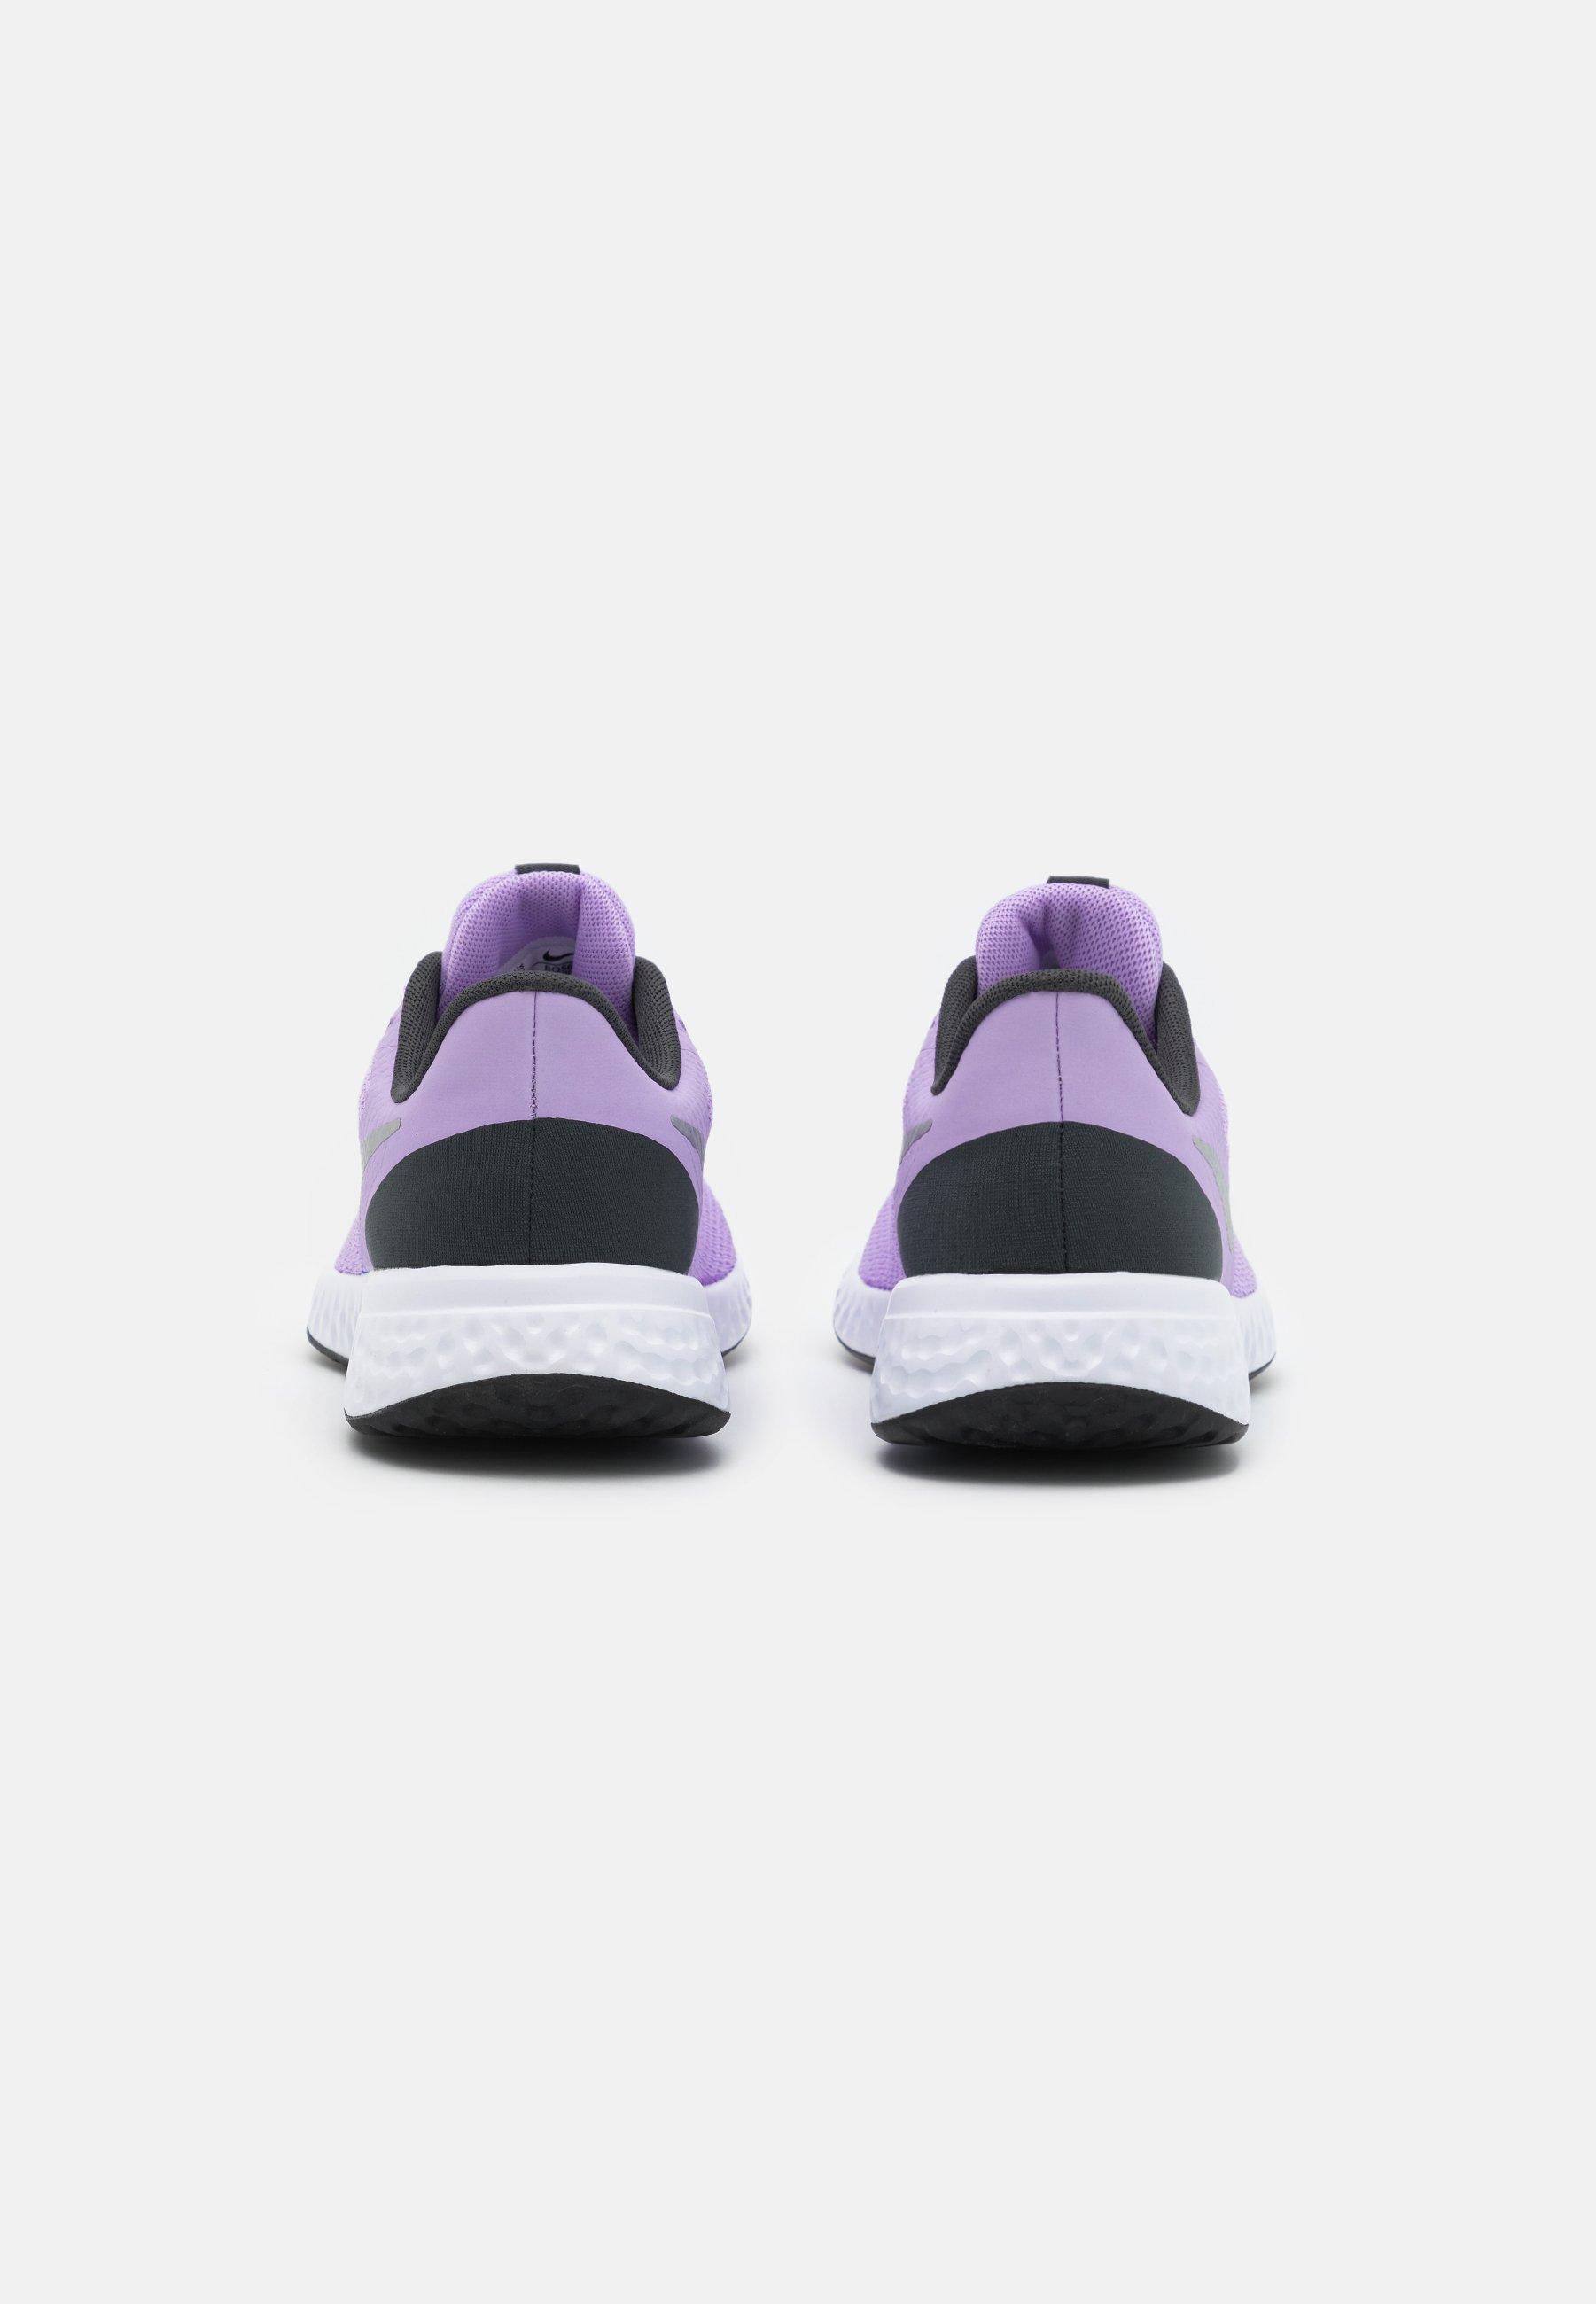 Enfant REVOLUTION 5 UNISEX - Chaussures de running neutres